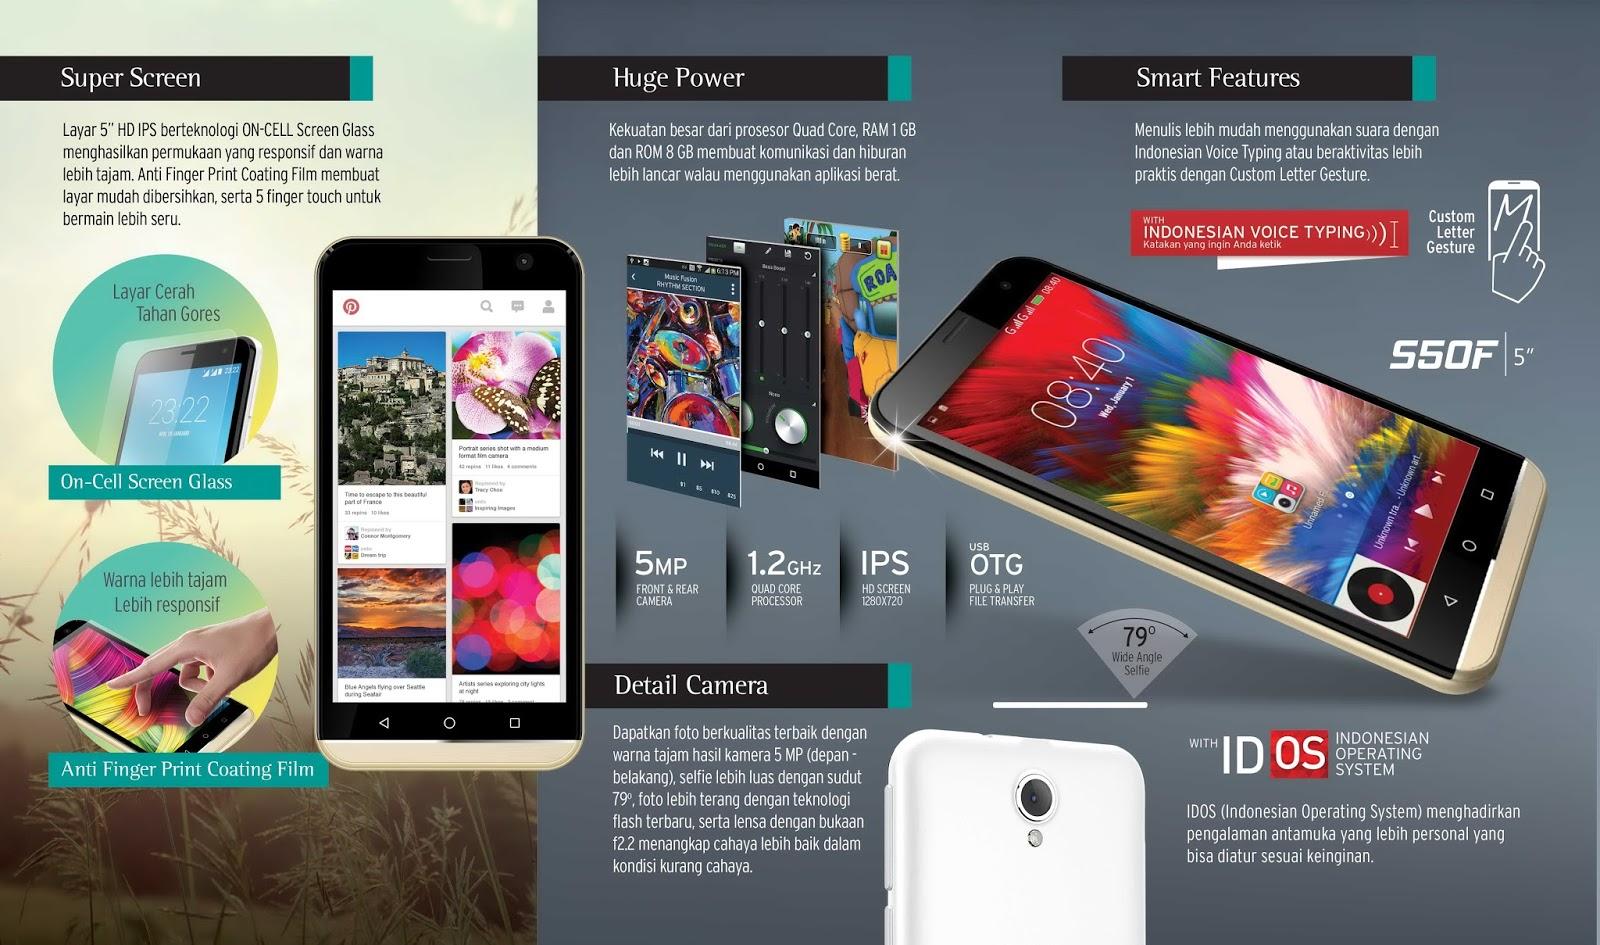 Spesifikasi Advan Vandroid S50f Smartphone Produk Tanah Air Ngintip Hp Like Follow Instagram Semua Negara